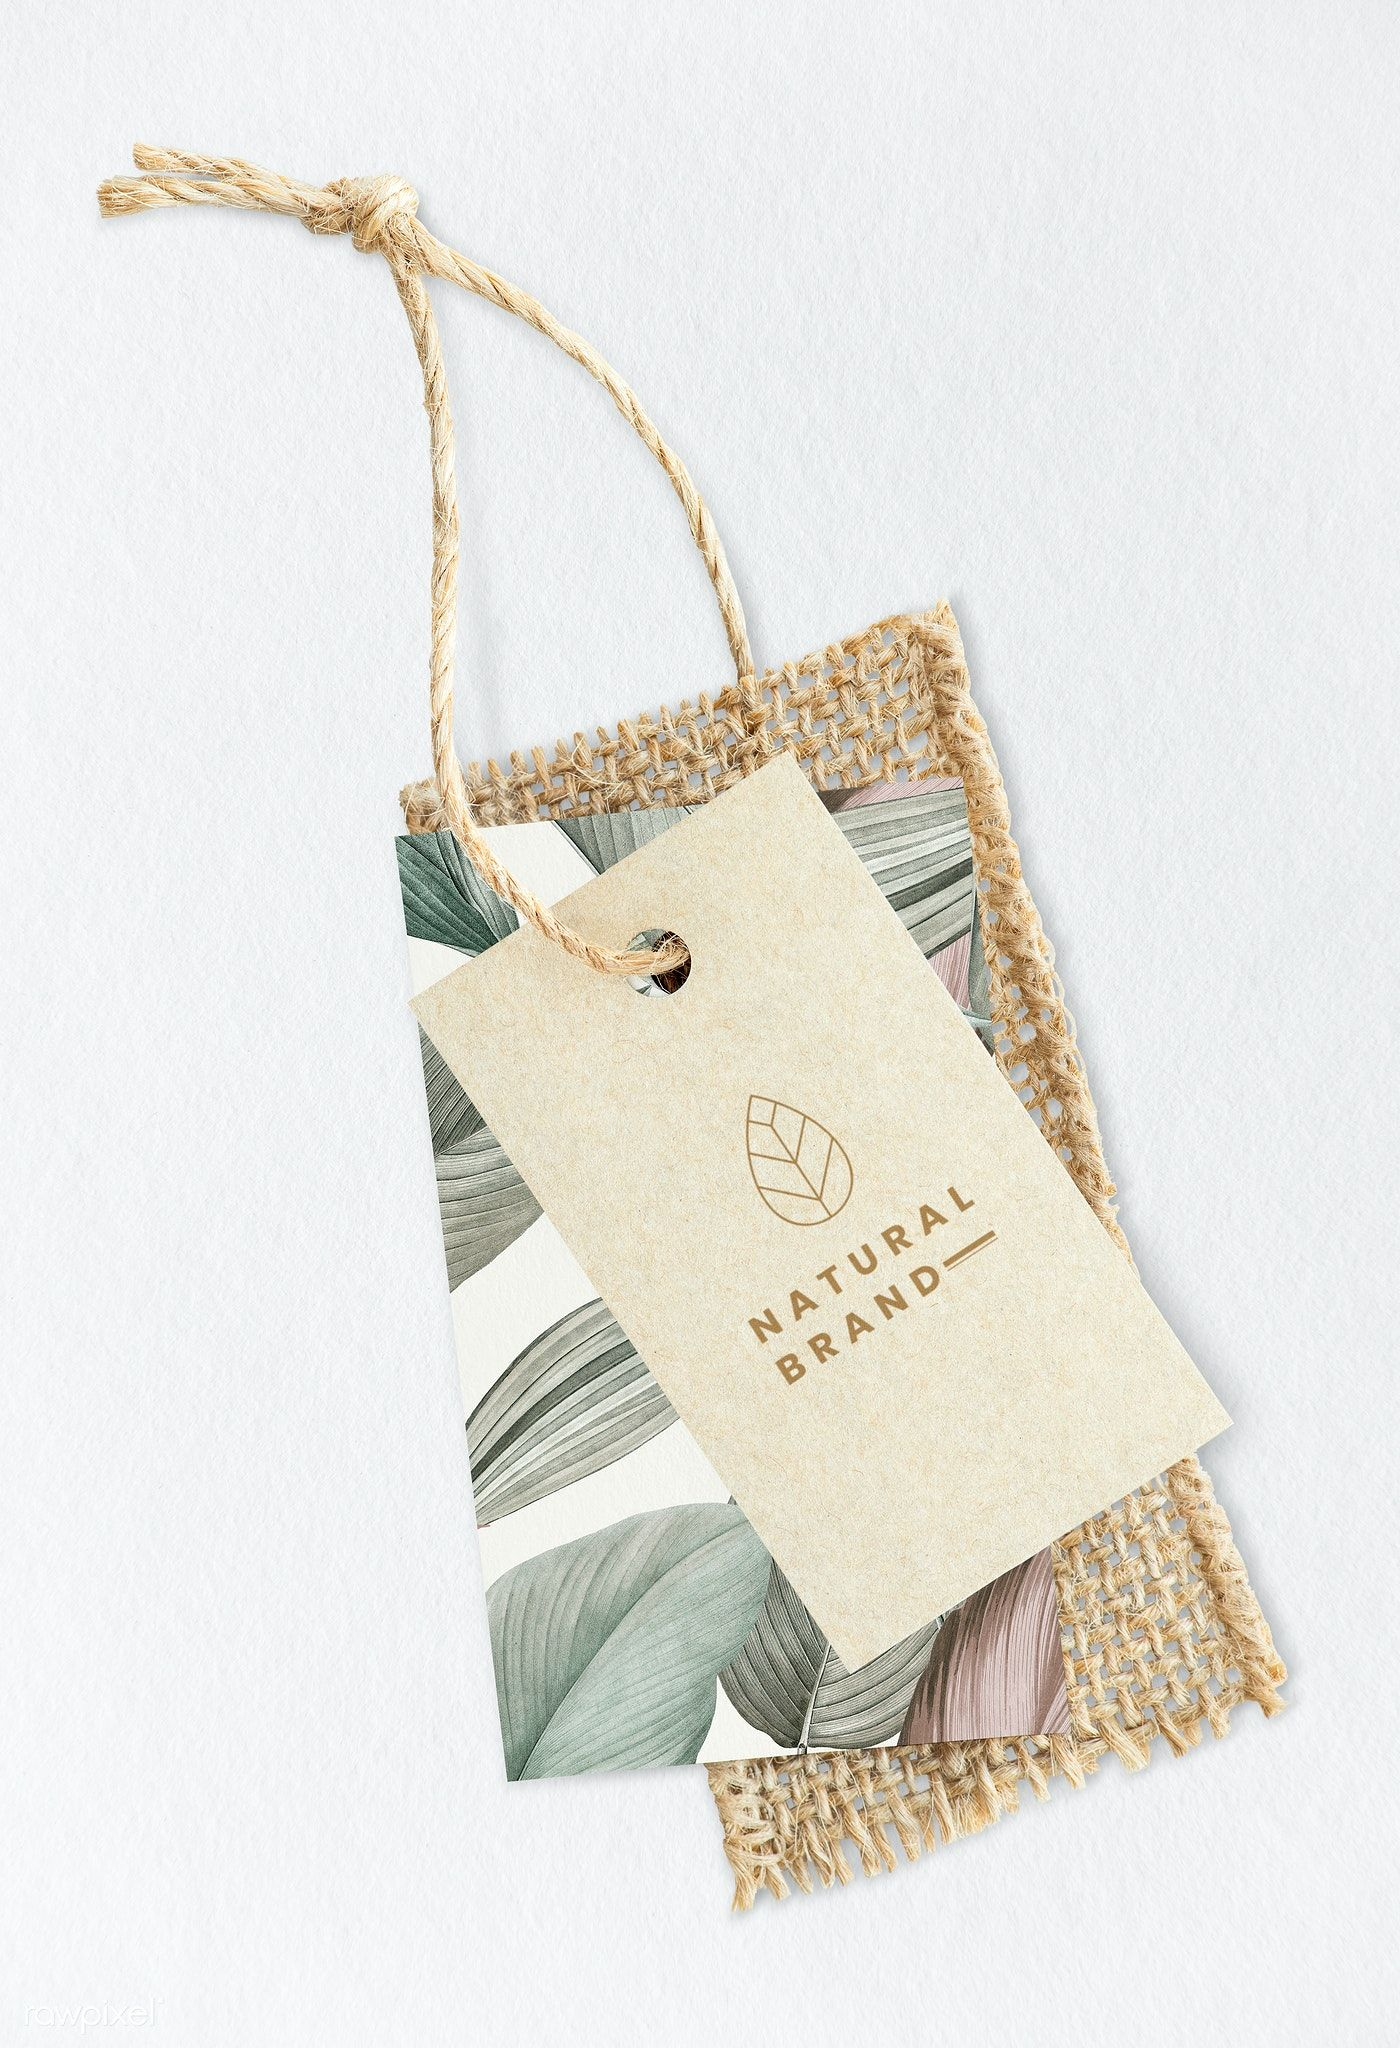 Download Download Premium Psd Of Leafy Natural Brand Label Mockup 1202157 Packaging Ideas Business Natural Branding Tag Design